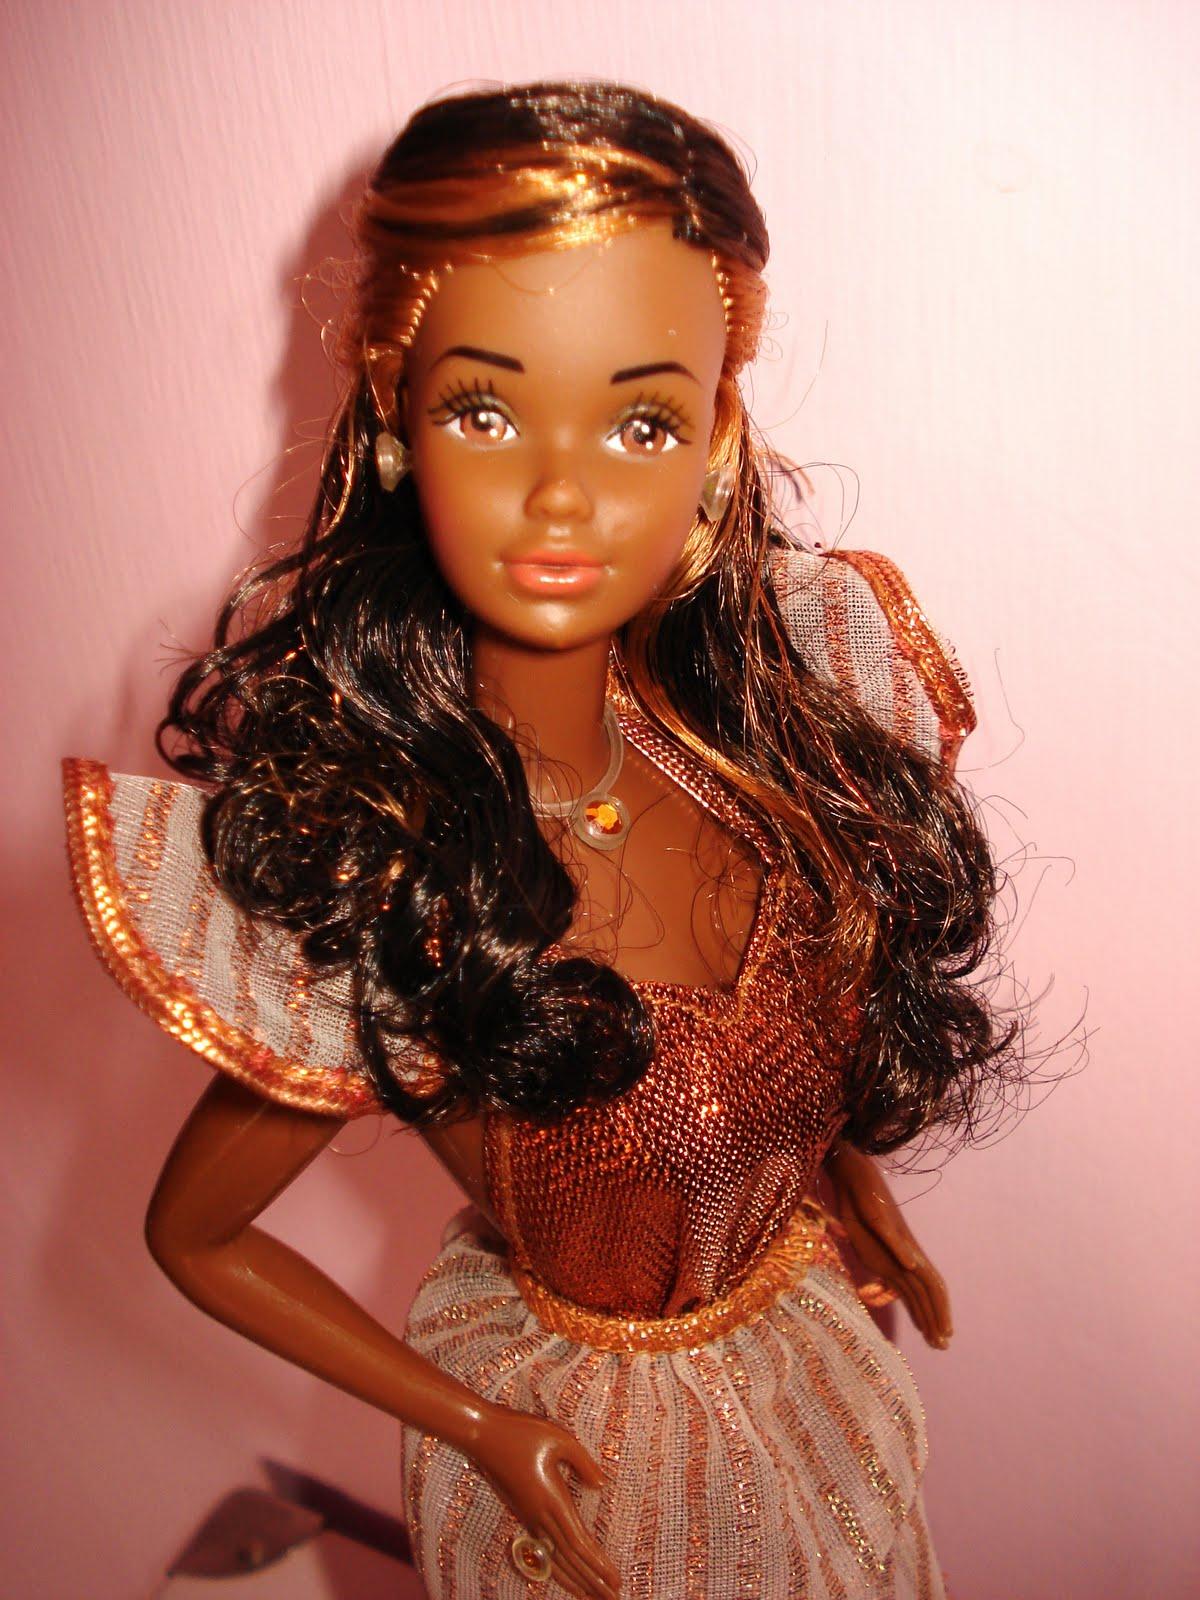 LS Stunning Dolls